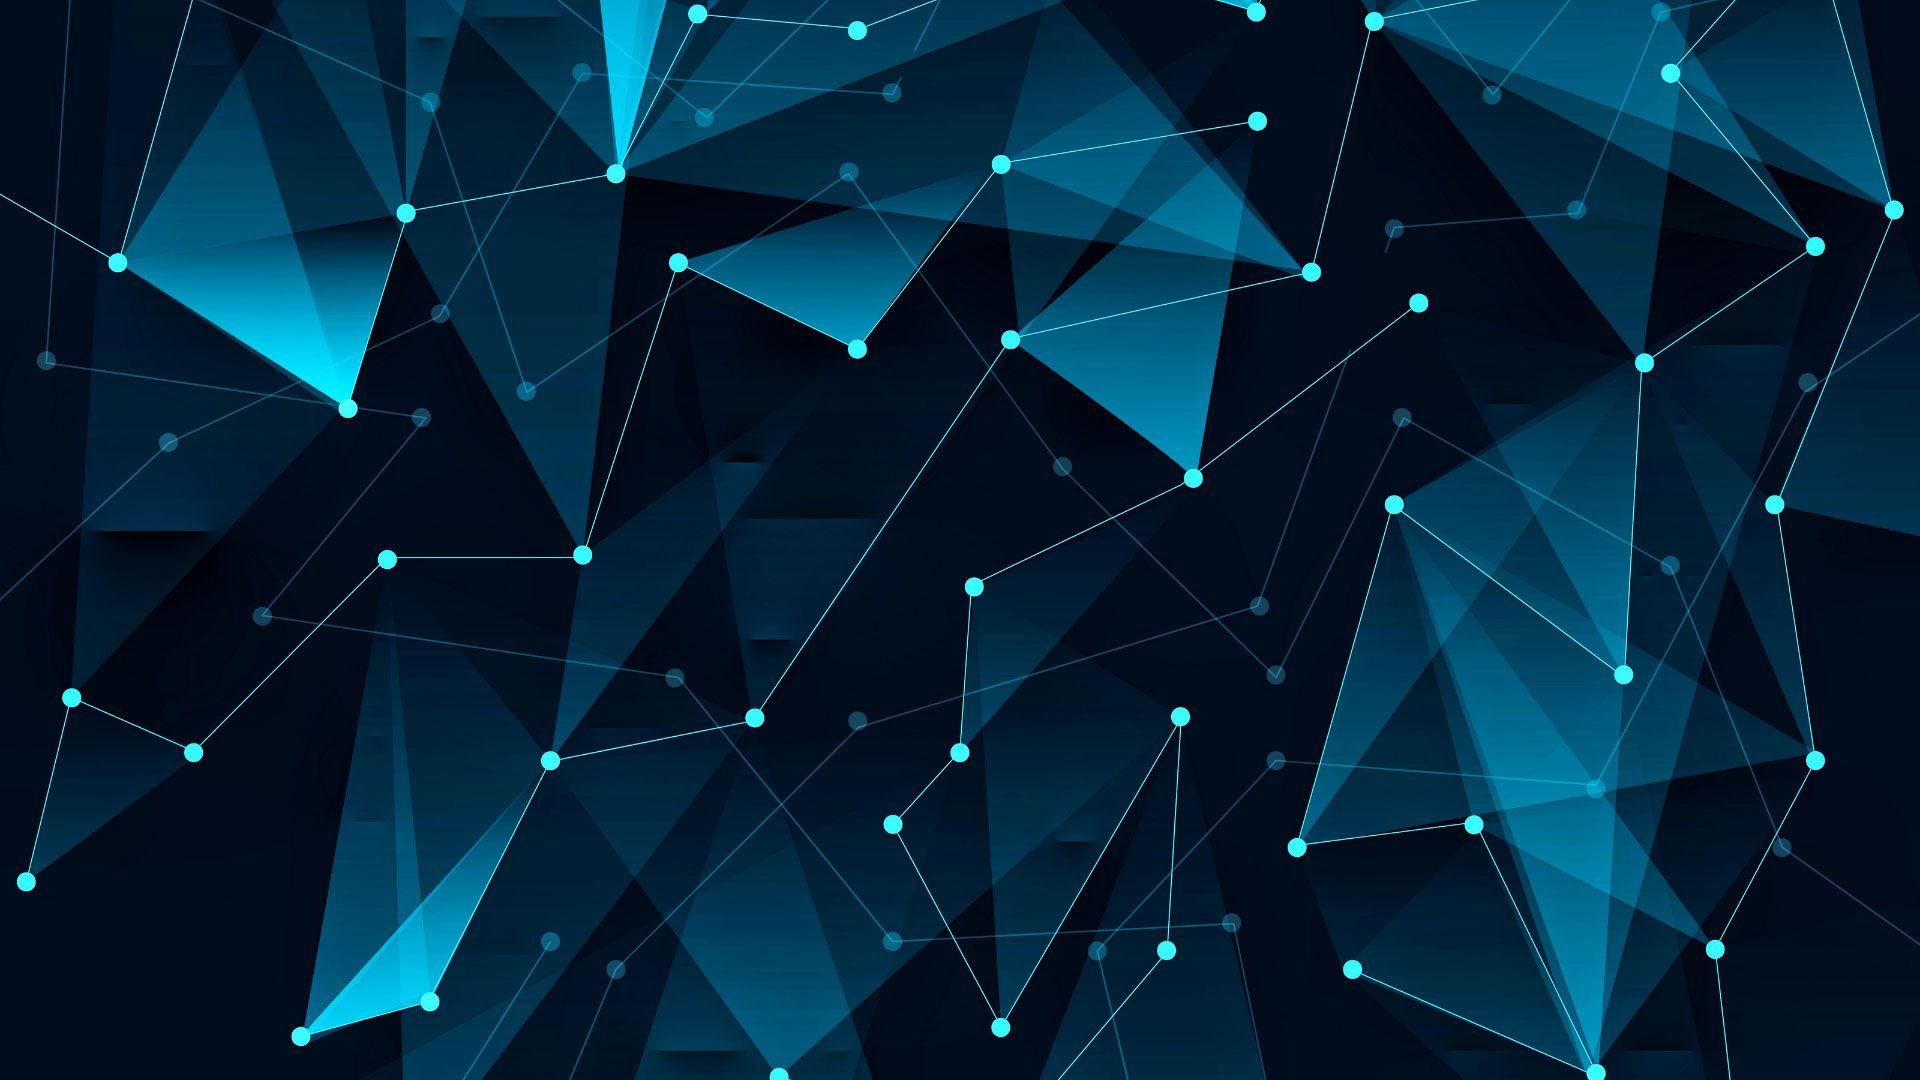 Geometric Digital Wallpaper Geometry Poly Vector Dots Abstract Geometric Digital Wallpaper Digital Wallpaper Abstract Wallpaper